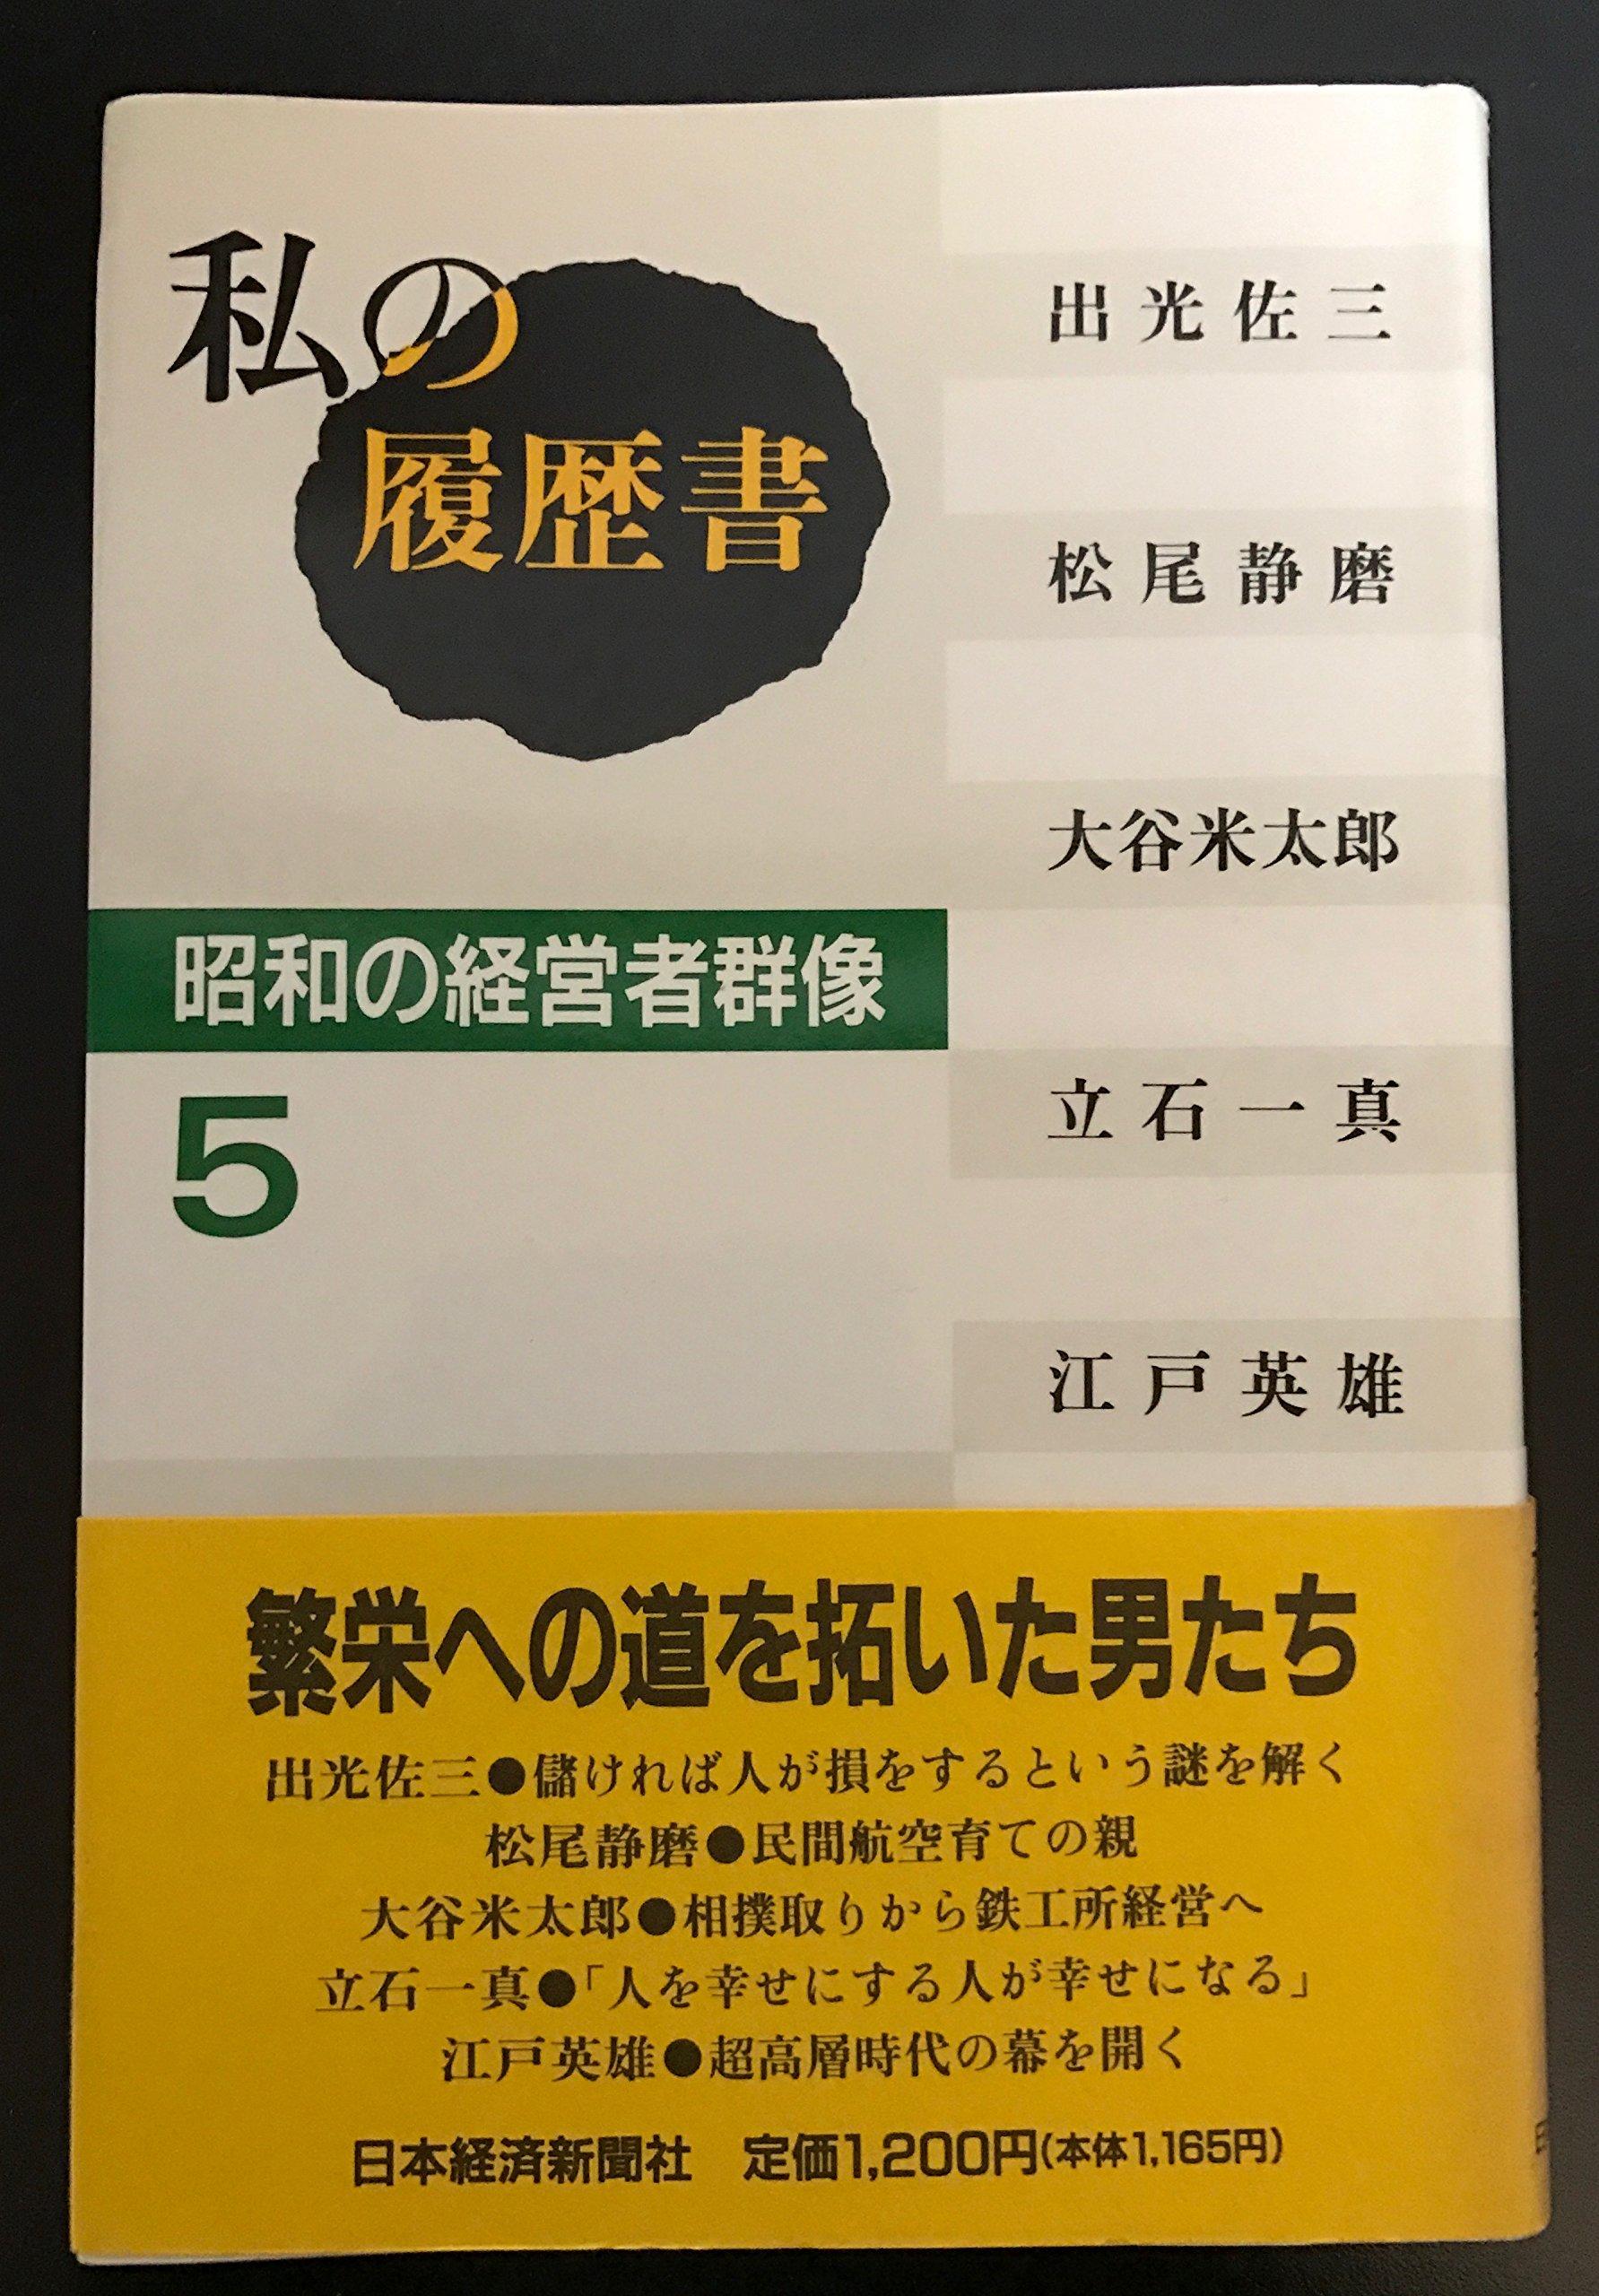 大谷 米太郎(Yonetaro Ohtani)